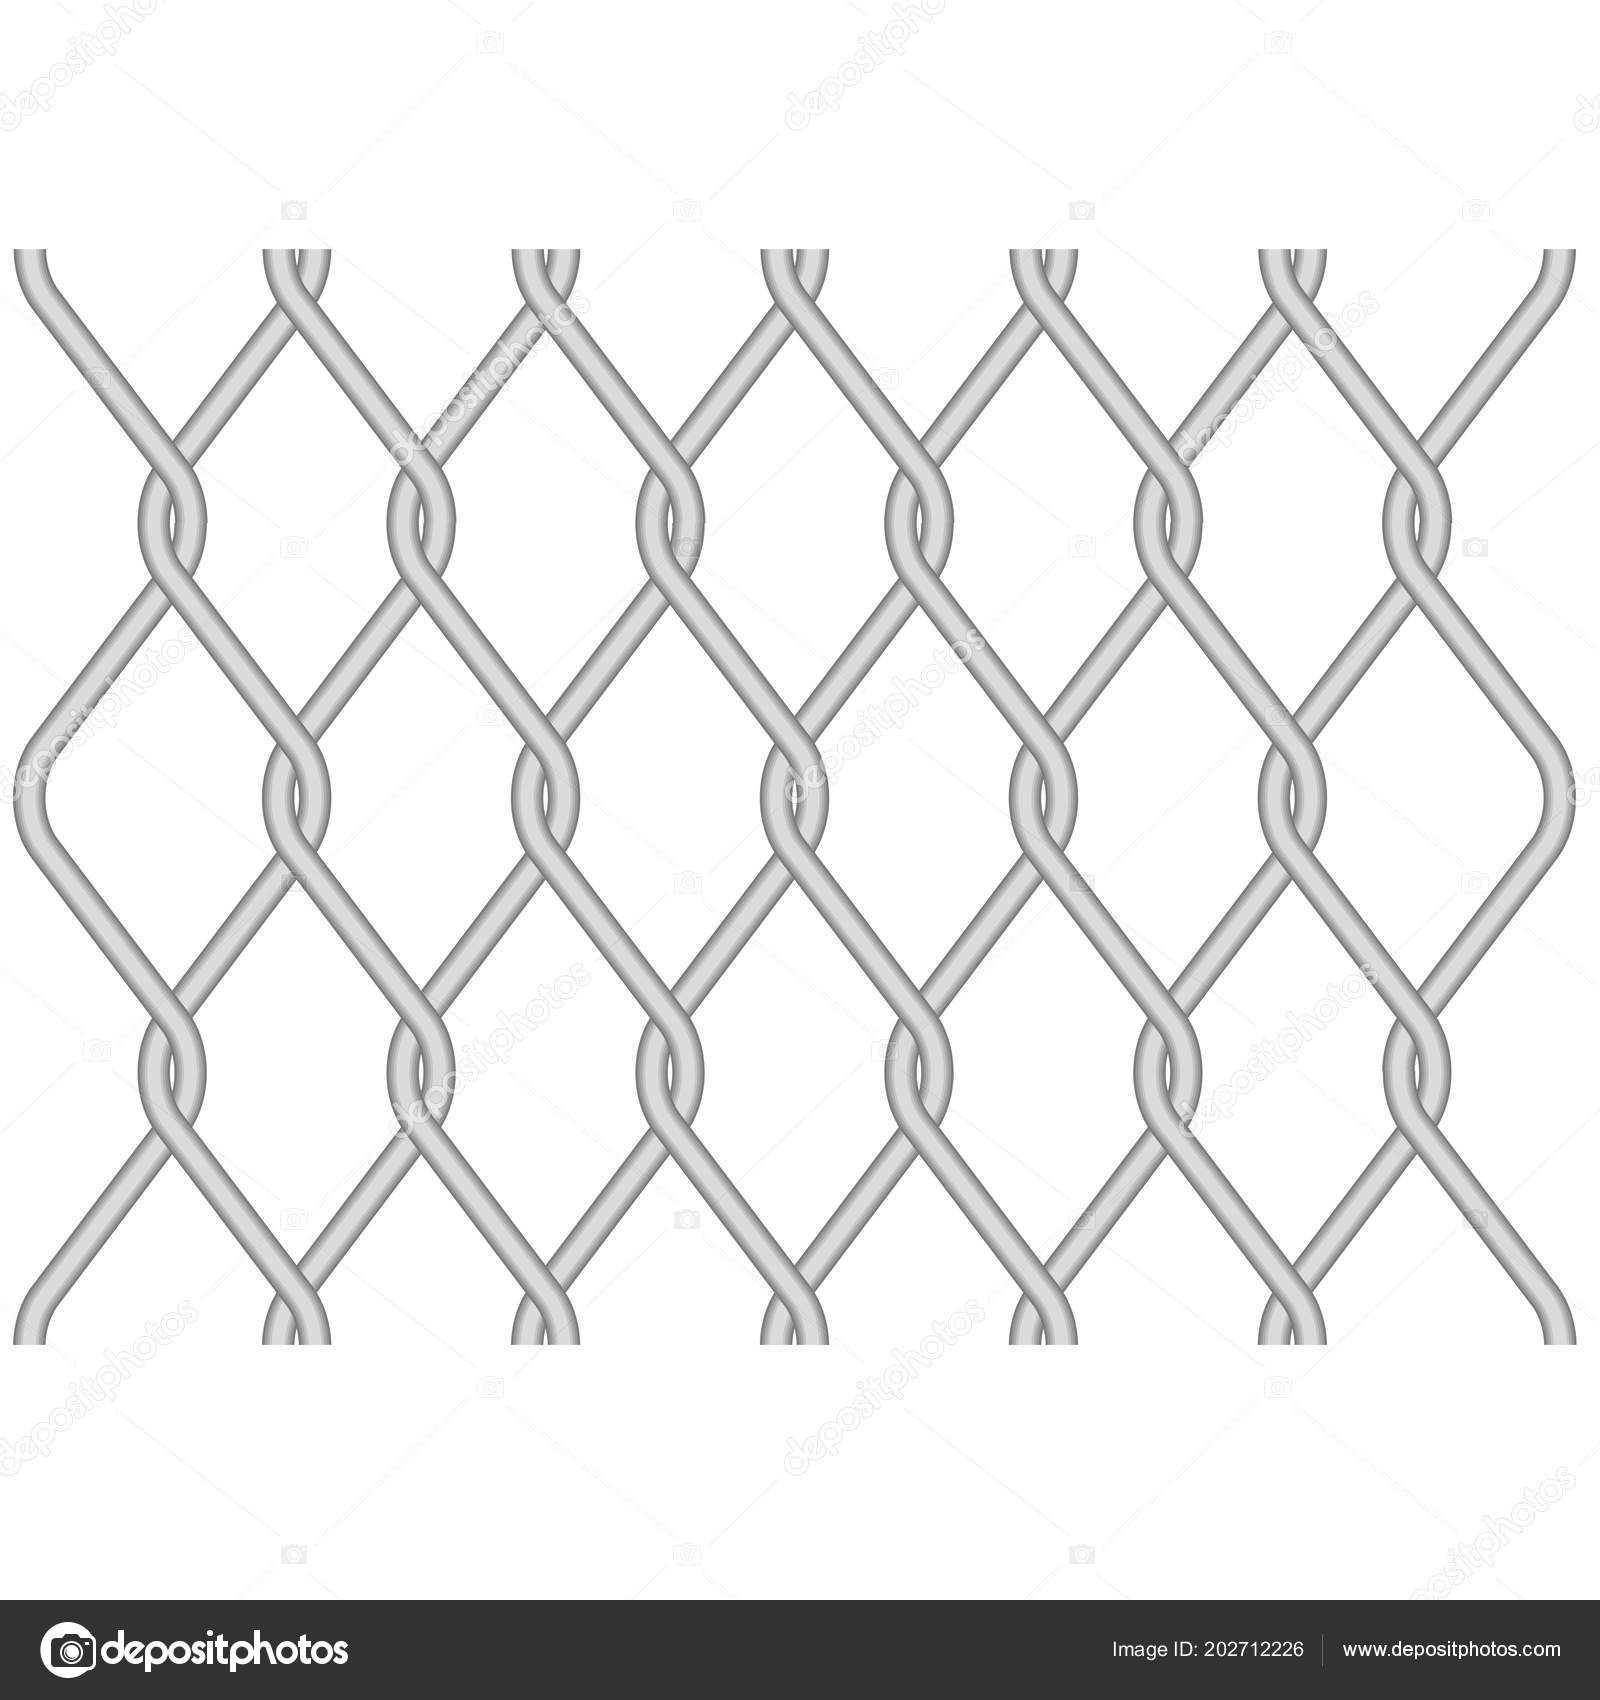 Rabitz Metallic Wire Mesh Pattern Twisted Wire Fence — Векторное ...